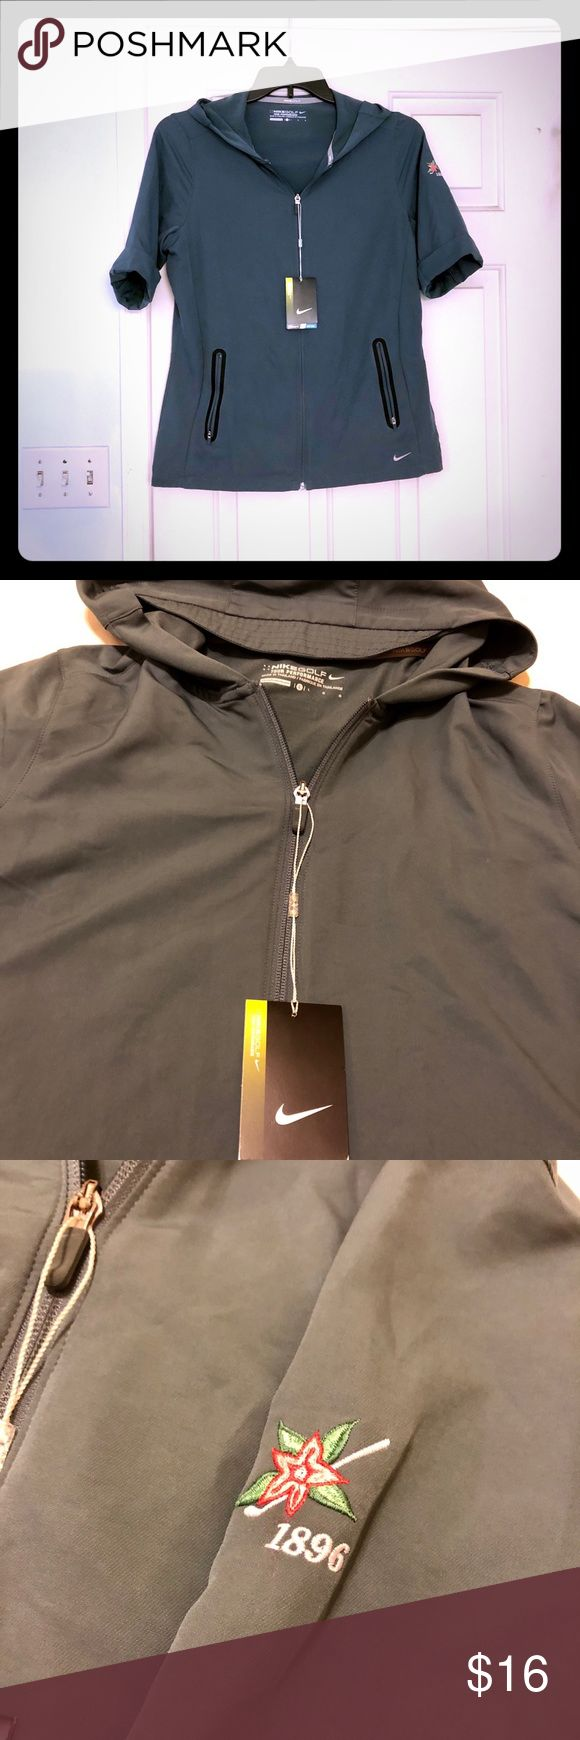 Nike golf jacket NWT Half sleeve Nike golf jacket with hood. Step up your game in this stylish jacket! Nike Jackets & Coats